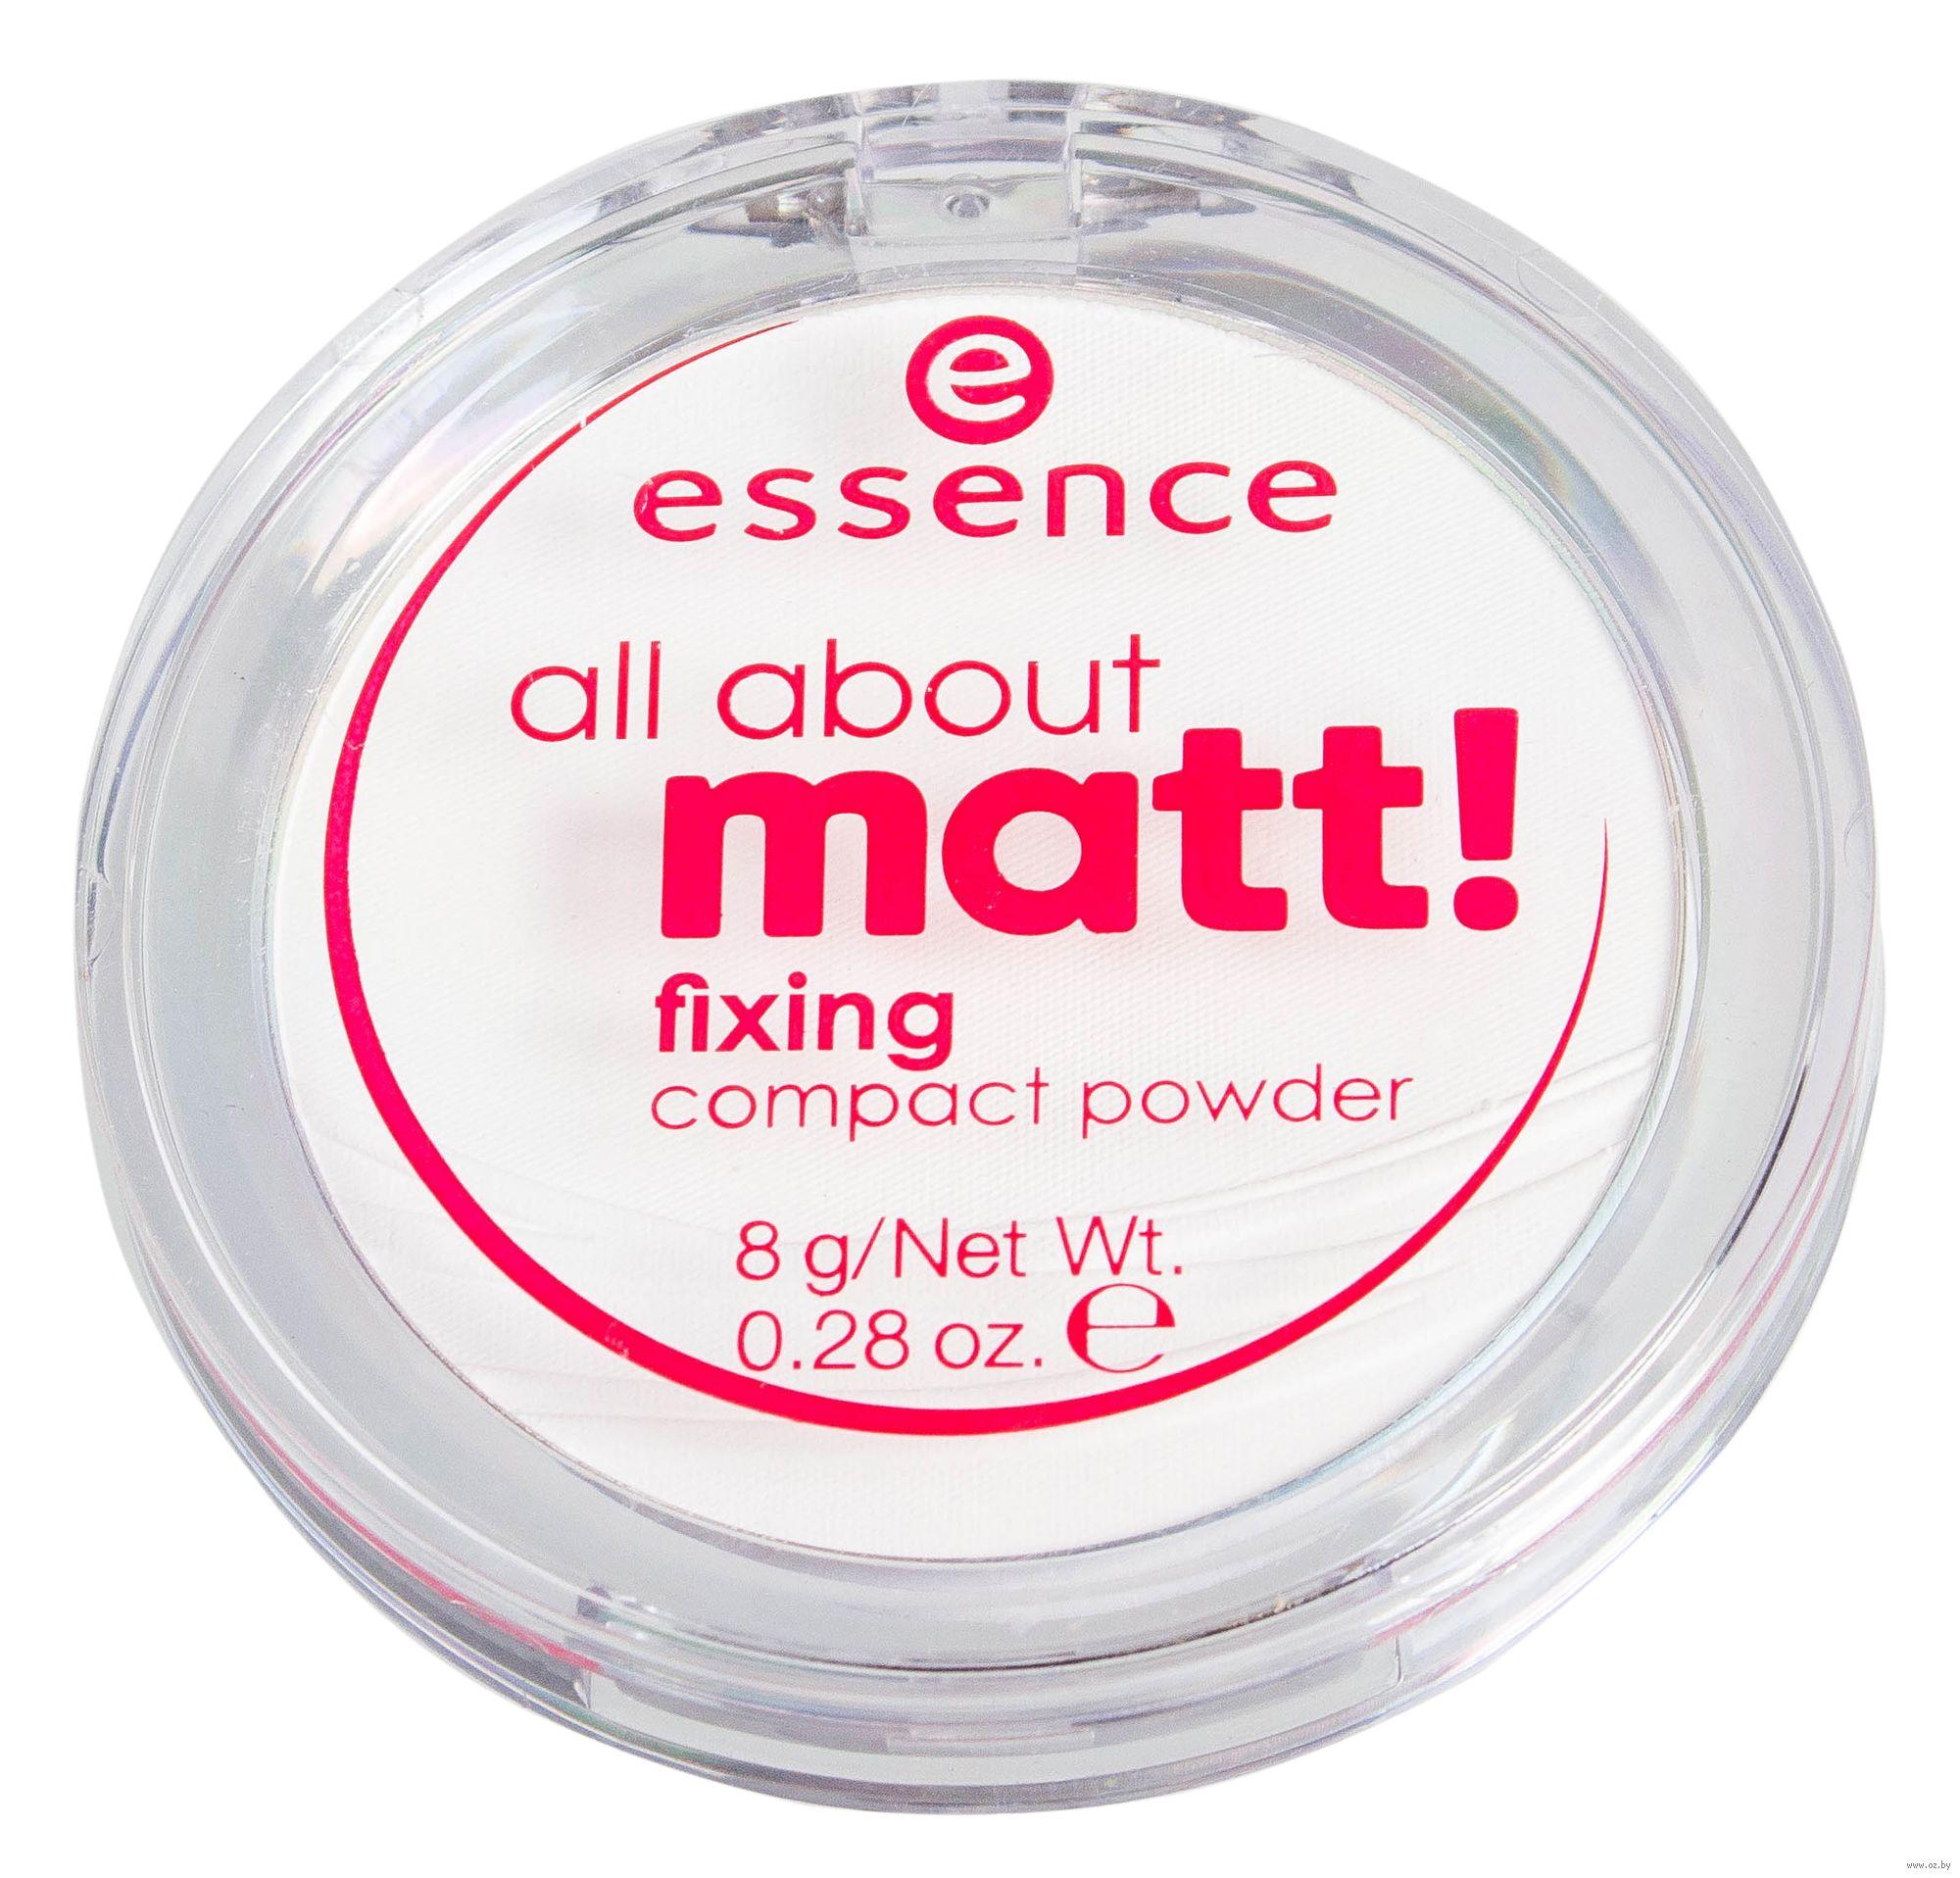 Фиксирующая пудра Essence «All about matt! Fixing»  купить пудру Эссенс в  Минске в интернет-магазине — OZ.by 94cd12652e2